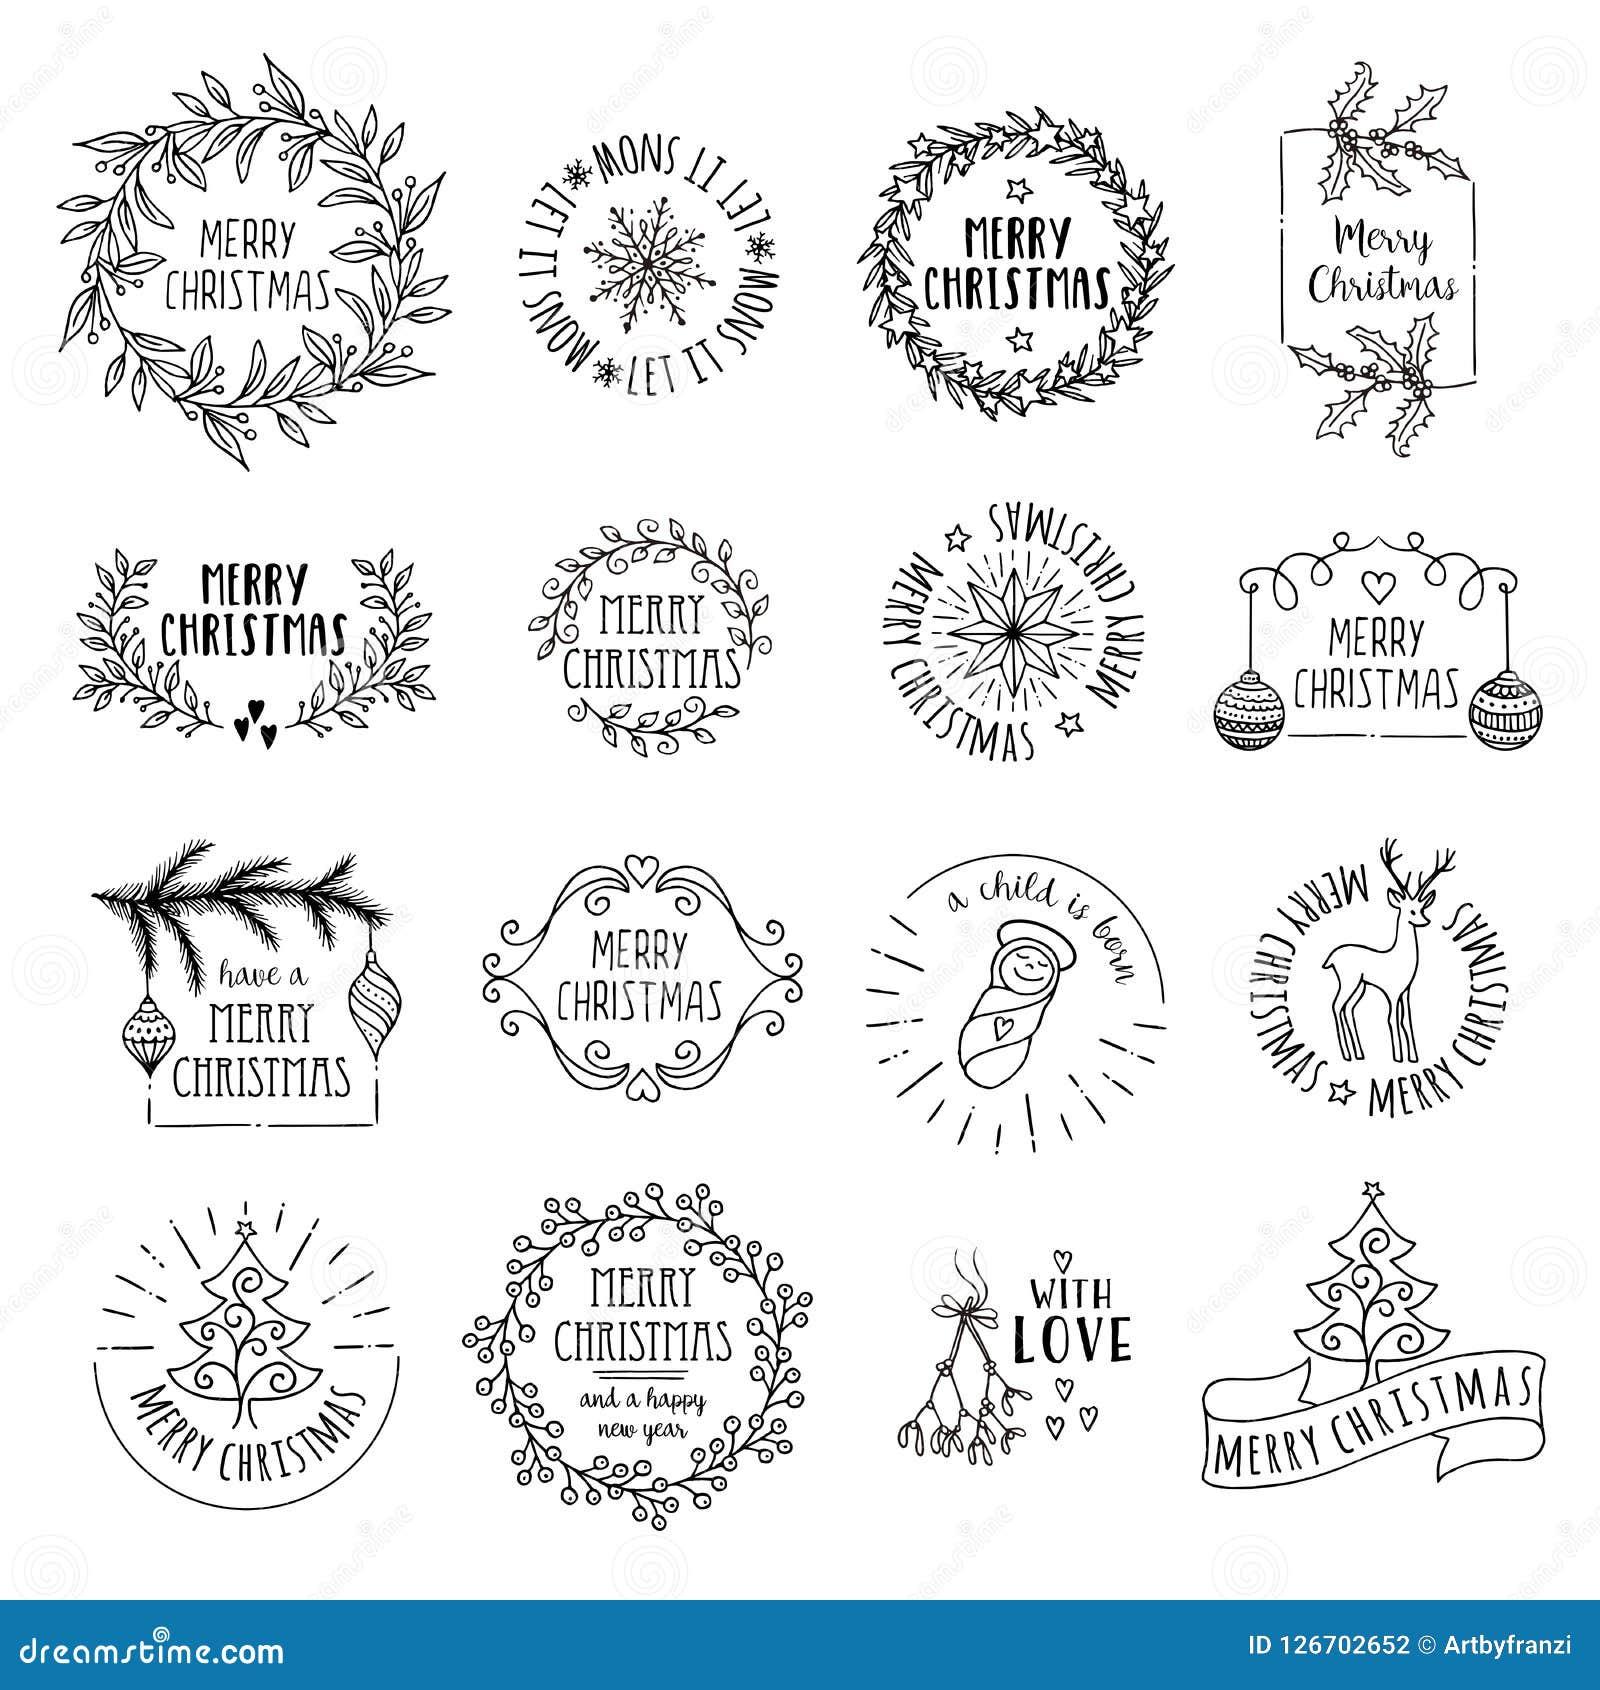 Little Christmas logos stock vector. Illustration of hand - 126702652